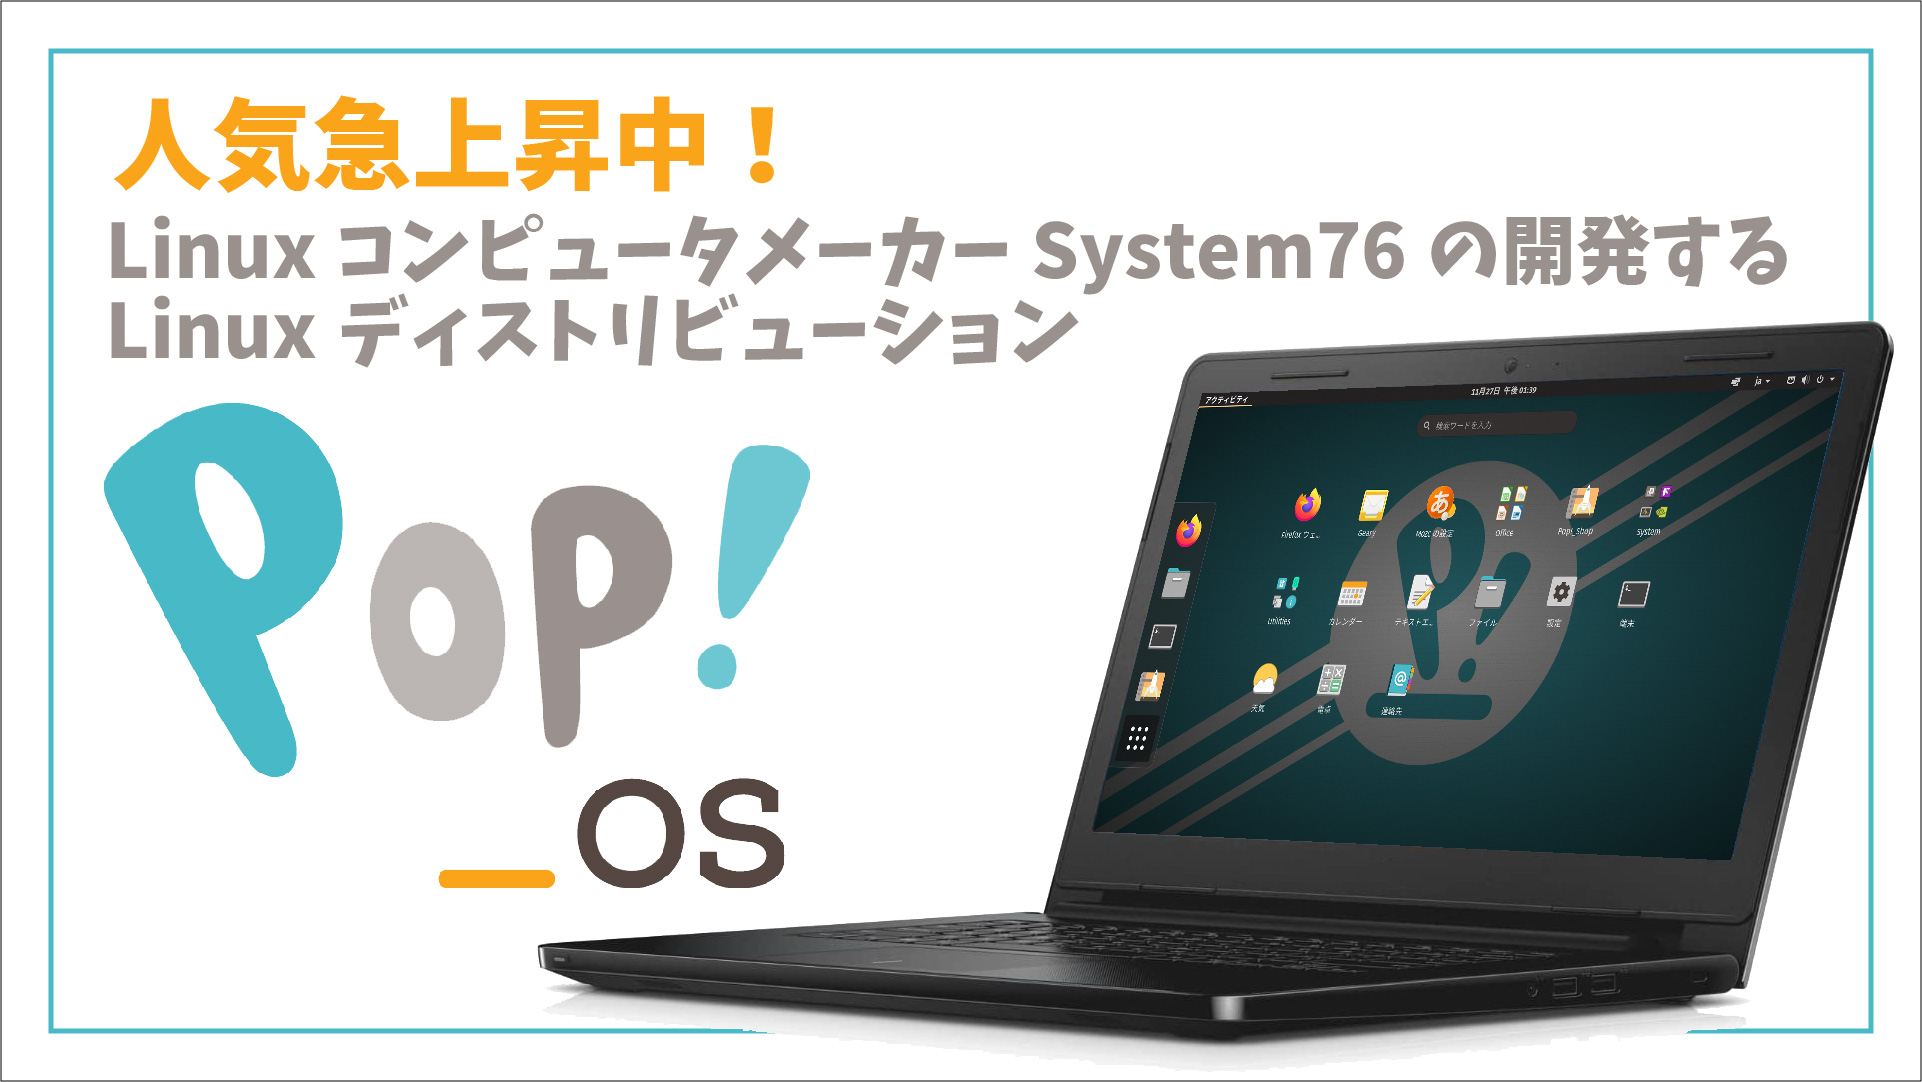 Pop!_OS 20.10: 人気急上昇中!System76 が開発する Ubuntu ベースの Linux ディストリビューションを試してみた。